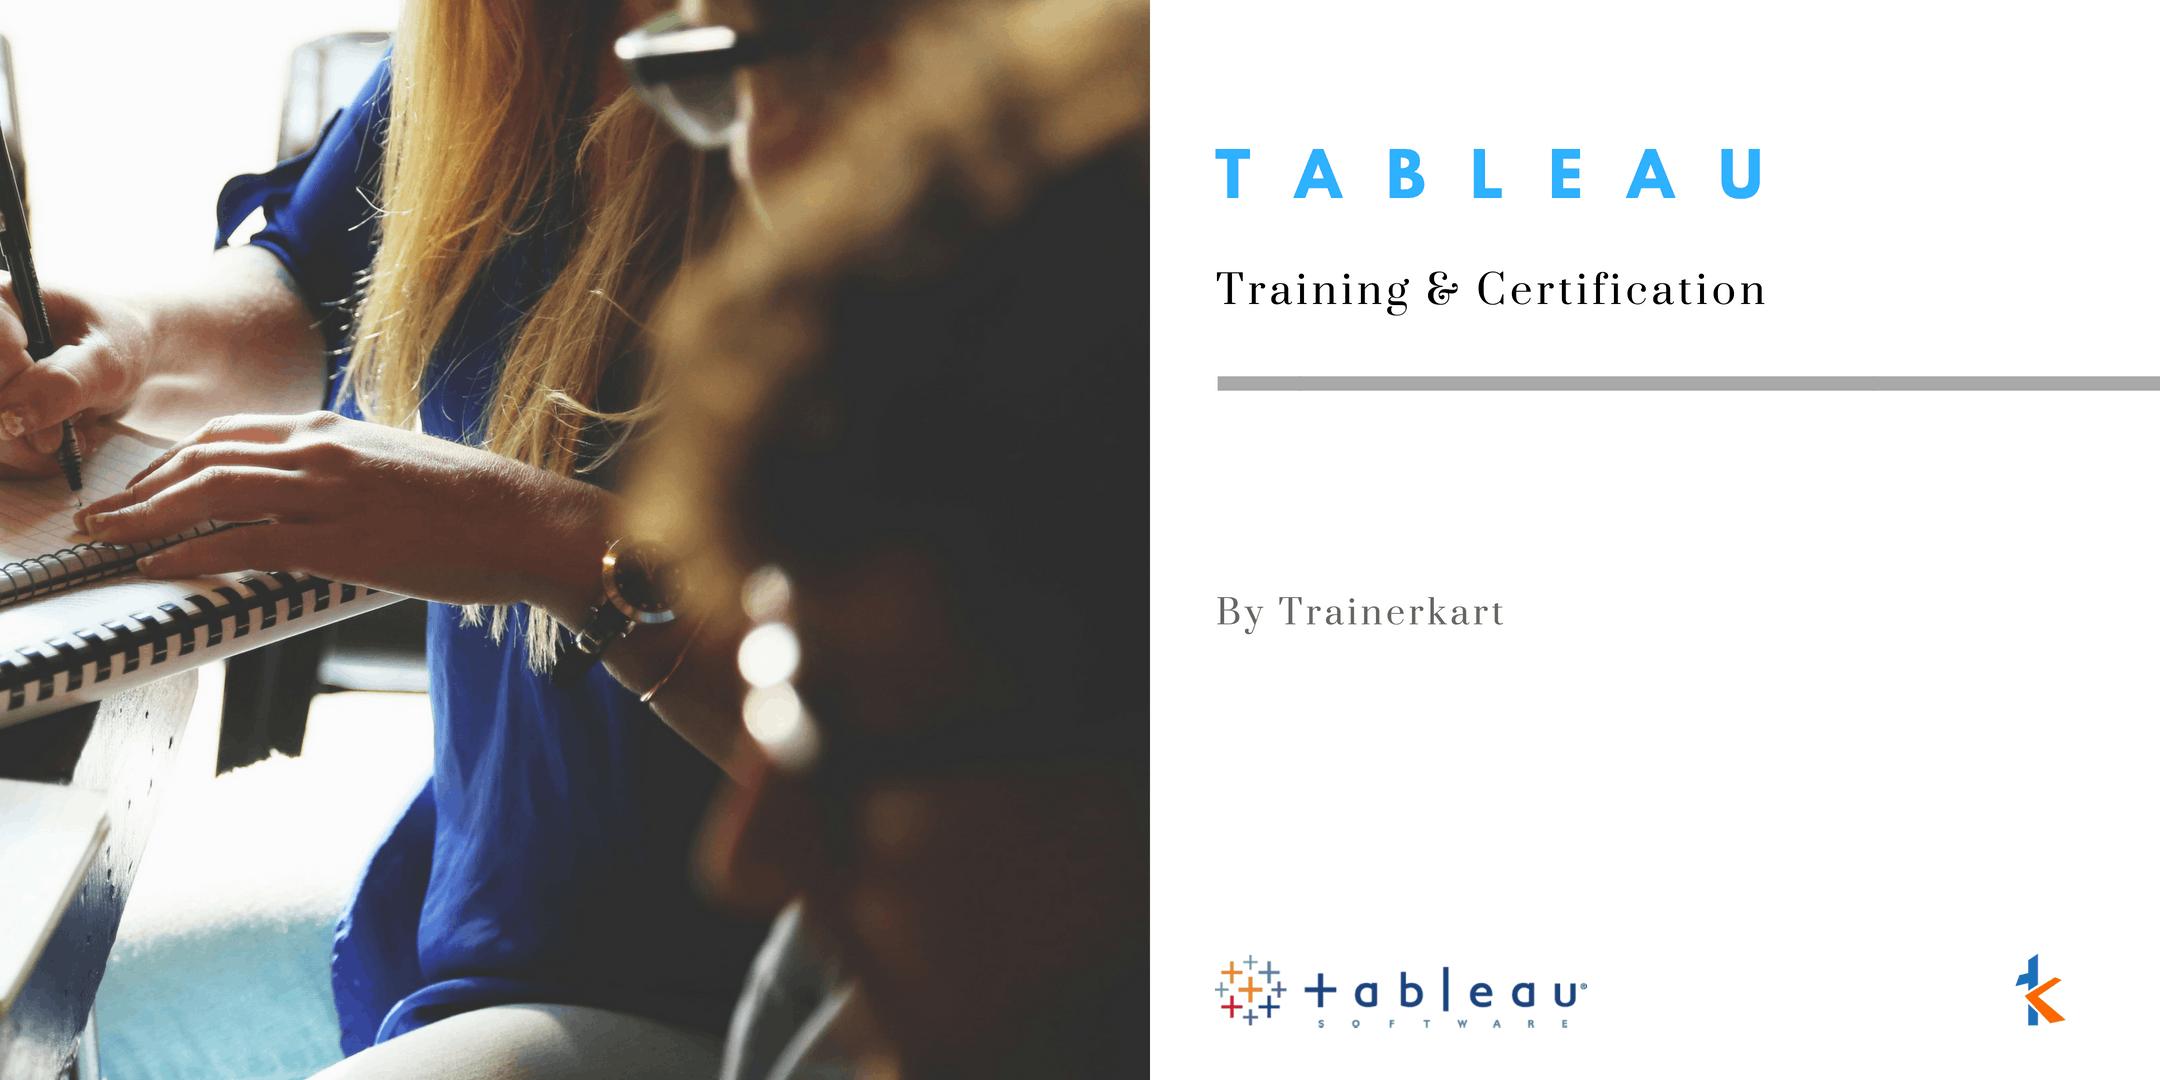 Tableau Classroom Training & Certification in